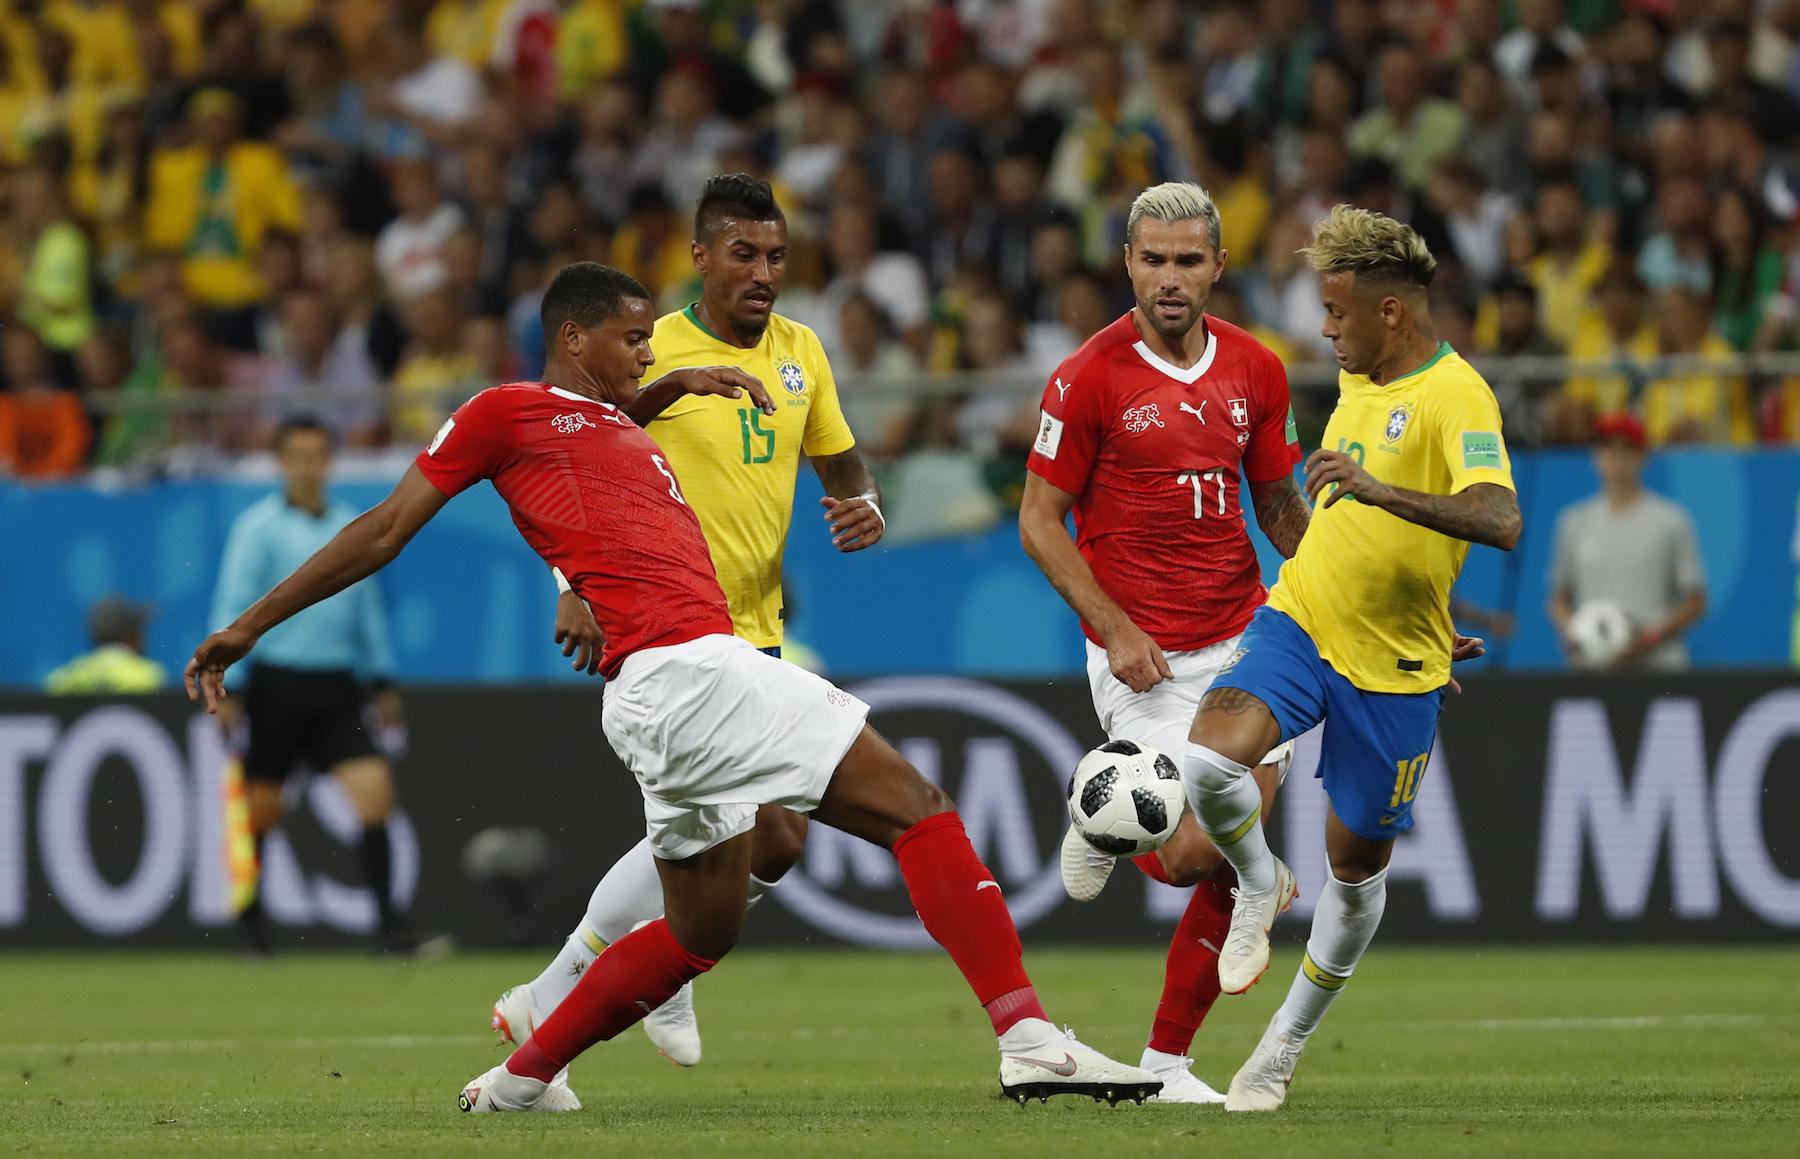 <div class='meta'><div class='origin-logo' data-origin='AP'></div><span class='caption-text' data-credit='AP Photo/Darko Vojinovic'>Brazil's Neymar, right, duels for the ball with Switzerland's Manuel Akanji during the group E match between Brazil and Switzerland at the 2018 soccer World Cup.</span></div>